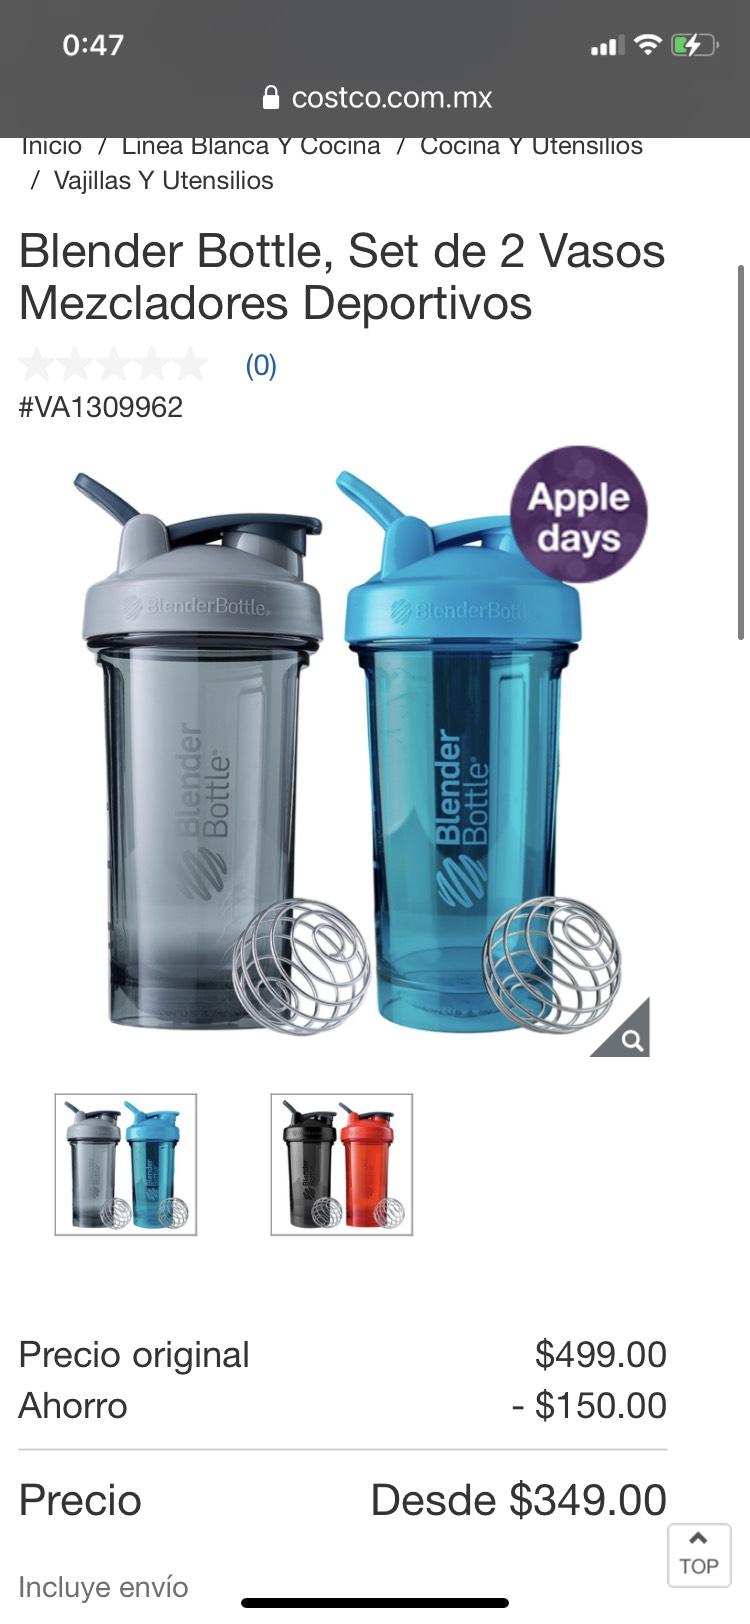 Costco: Blender Bottle, Set de 2 Vasos Mezcladores Deportivos costco